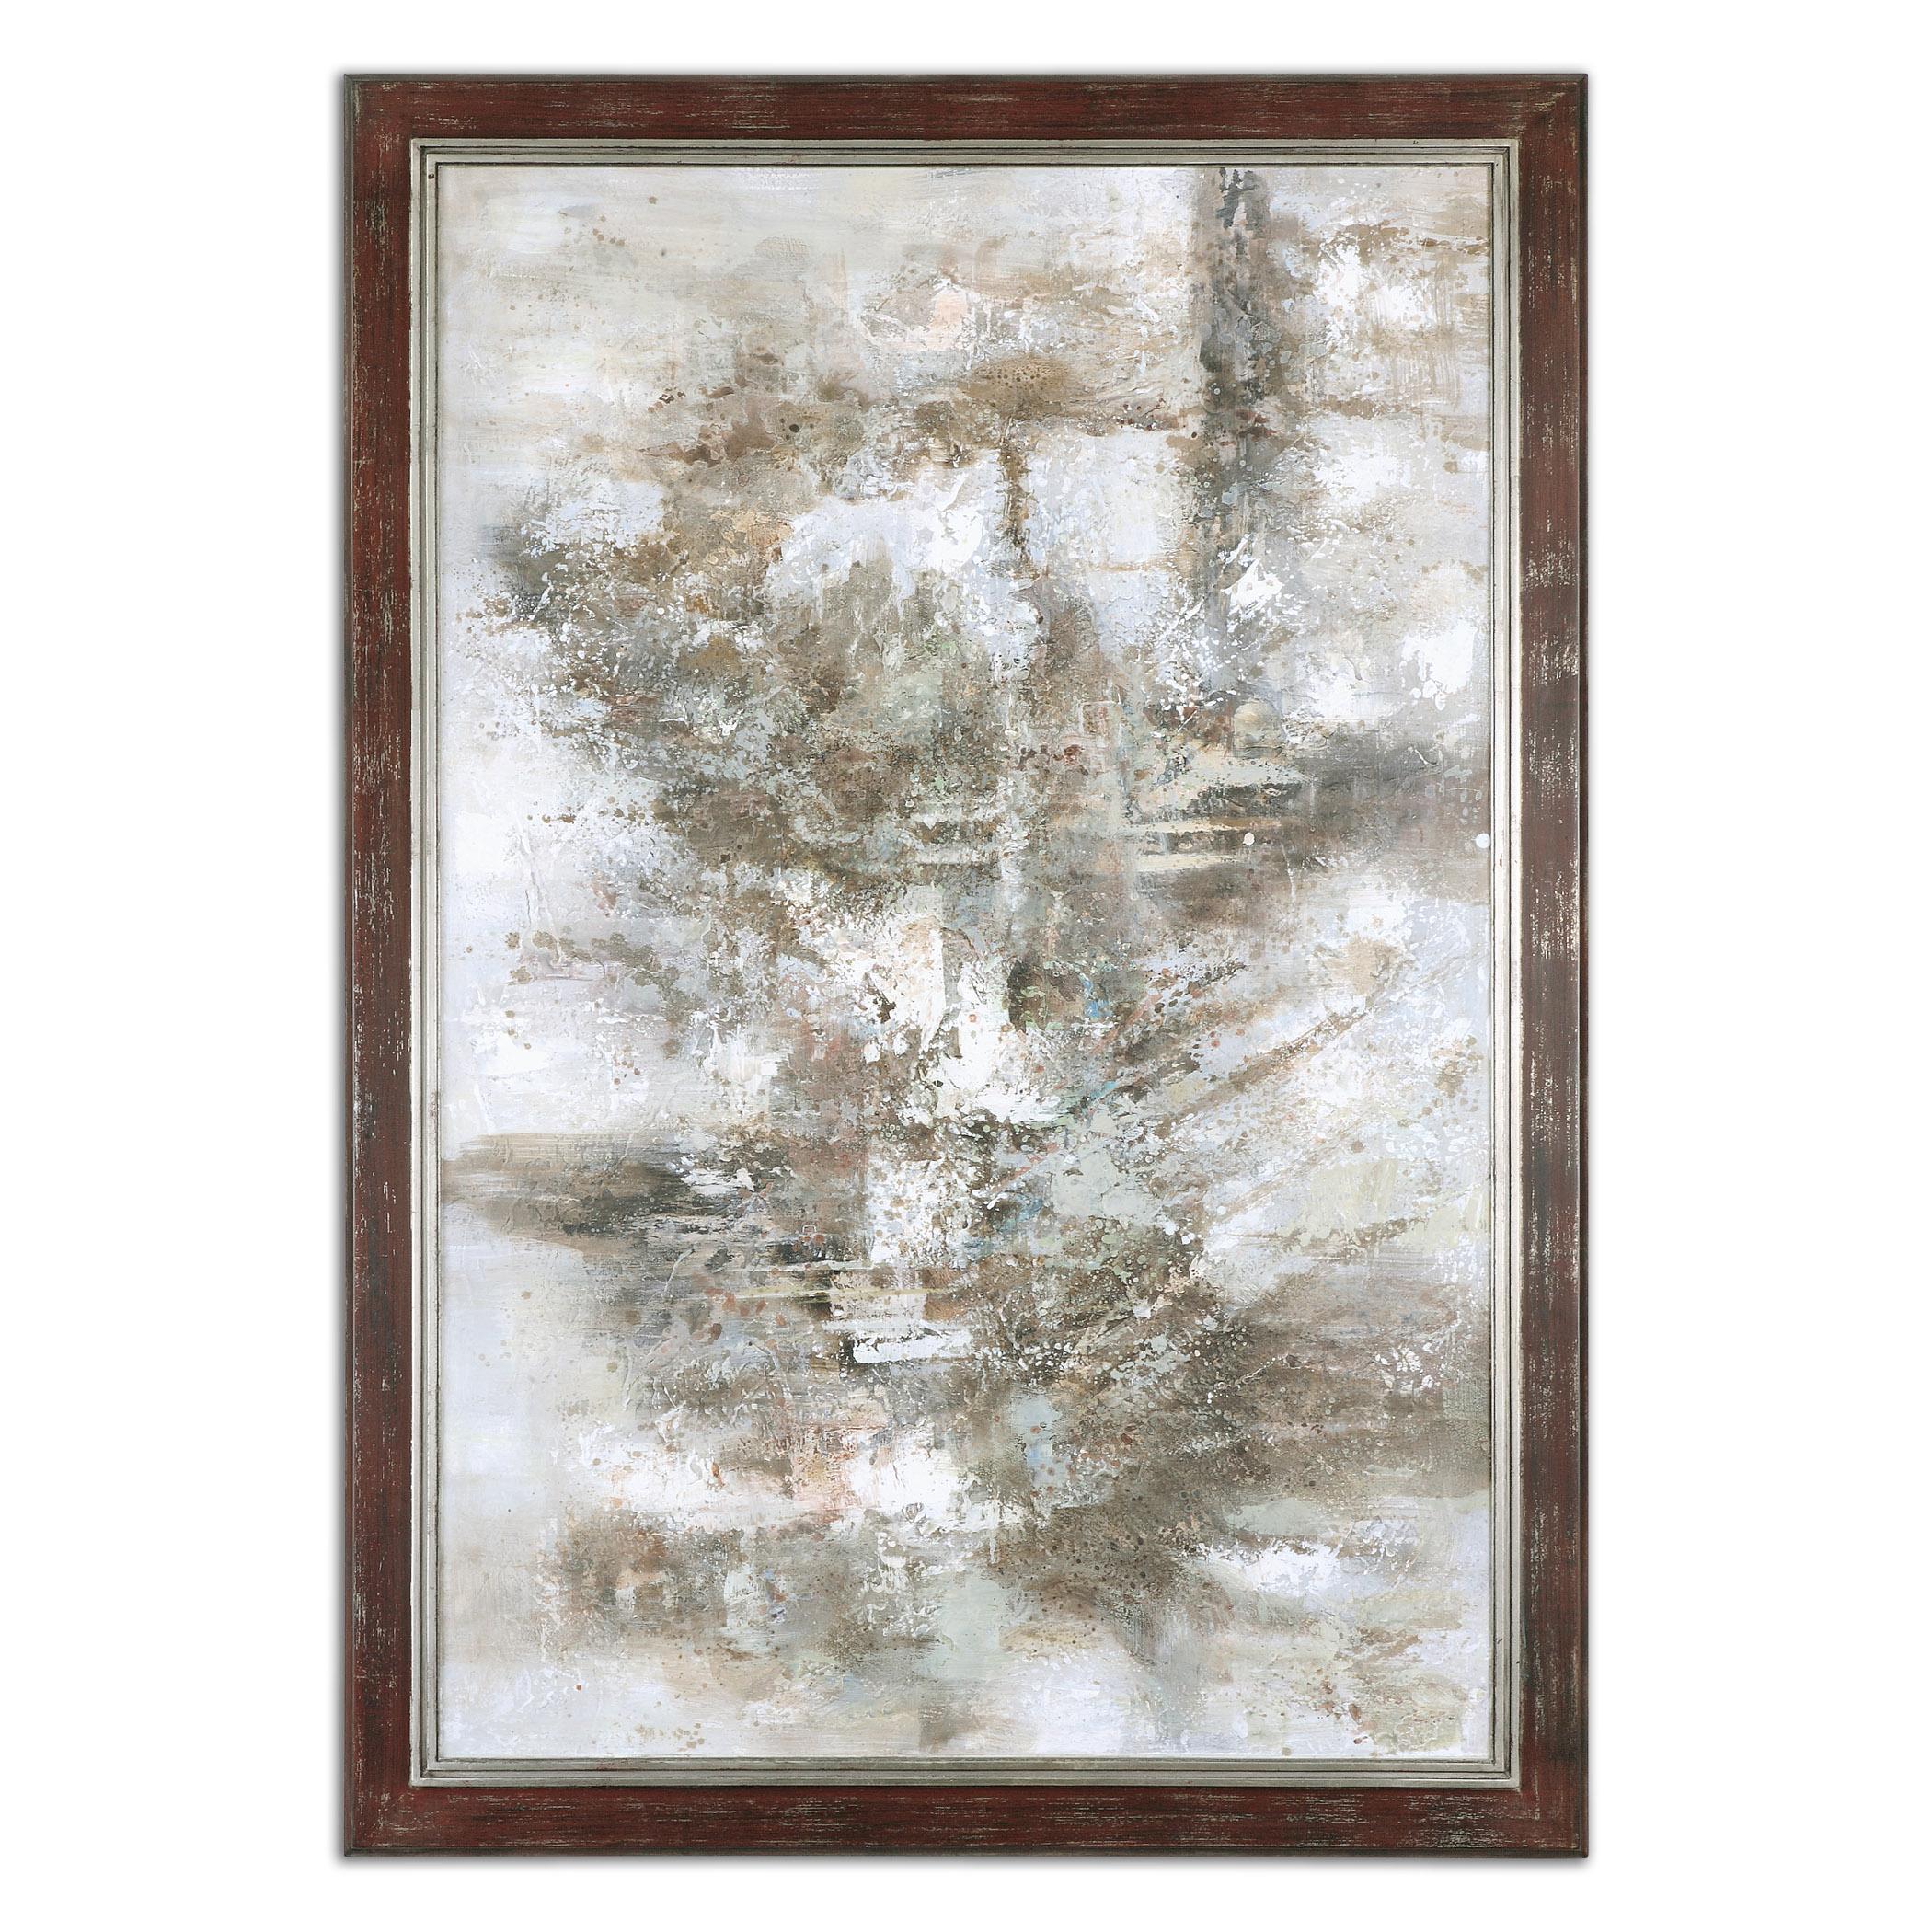 Uttermost Art Dark Expressions Framed Art - Item Number: 41530